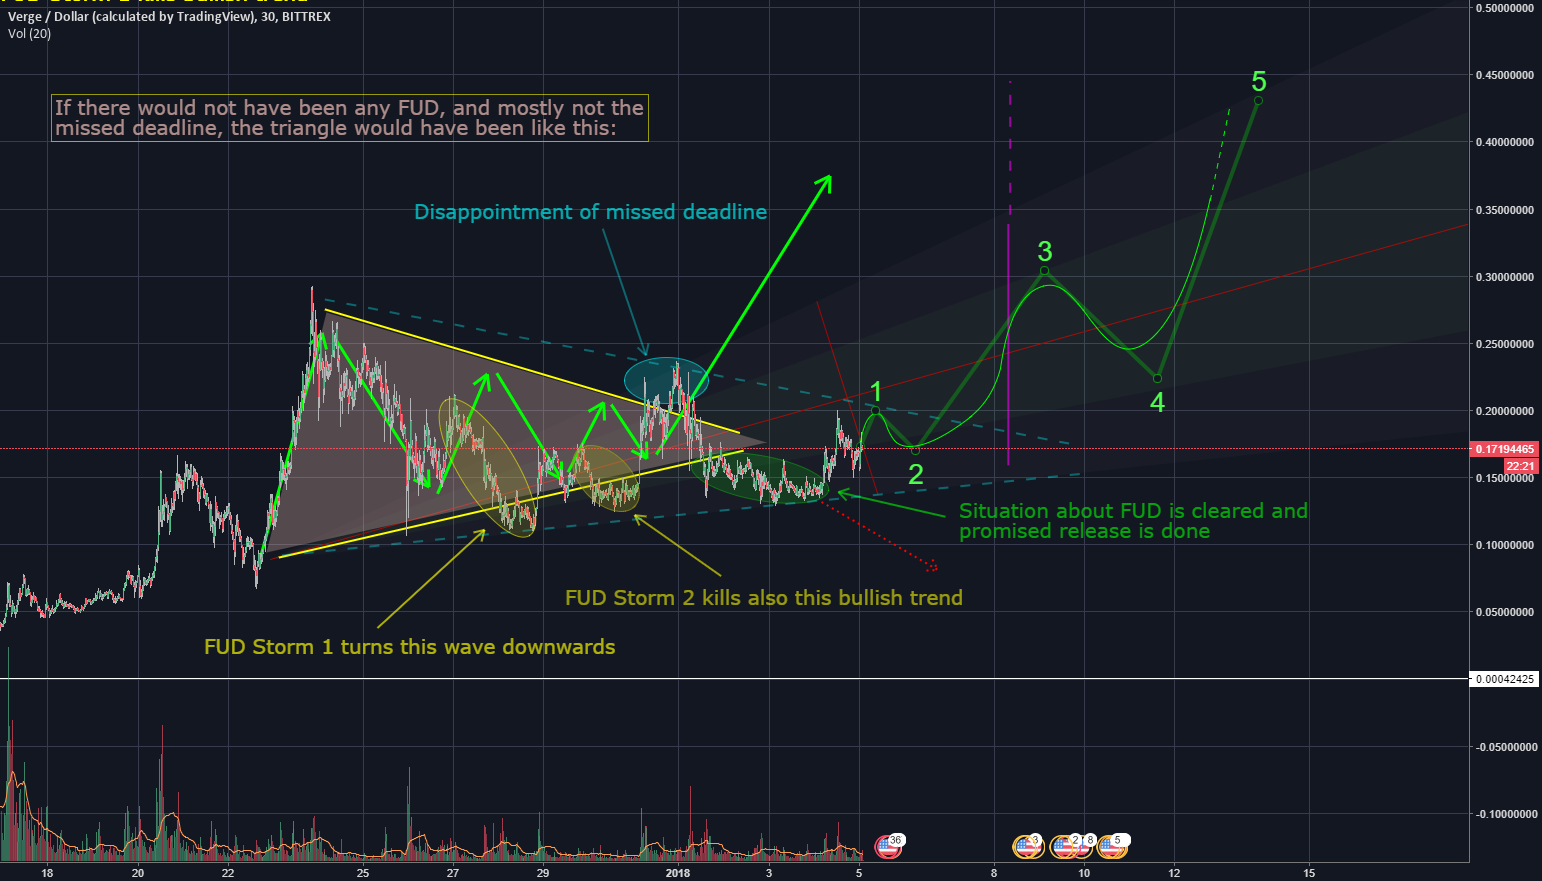 XVGBTC XVG/USD Verge, triangle in triangle